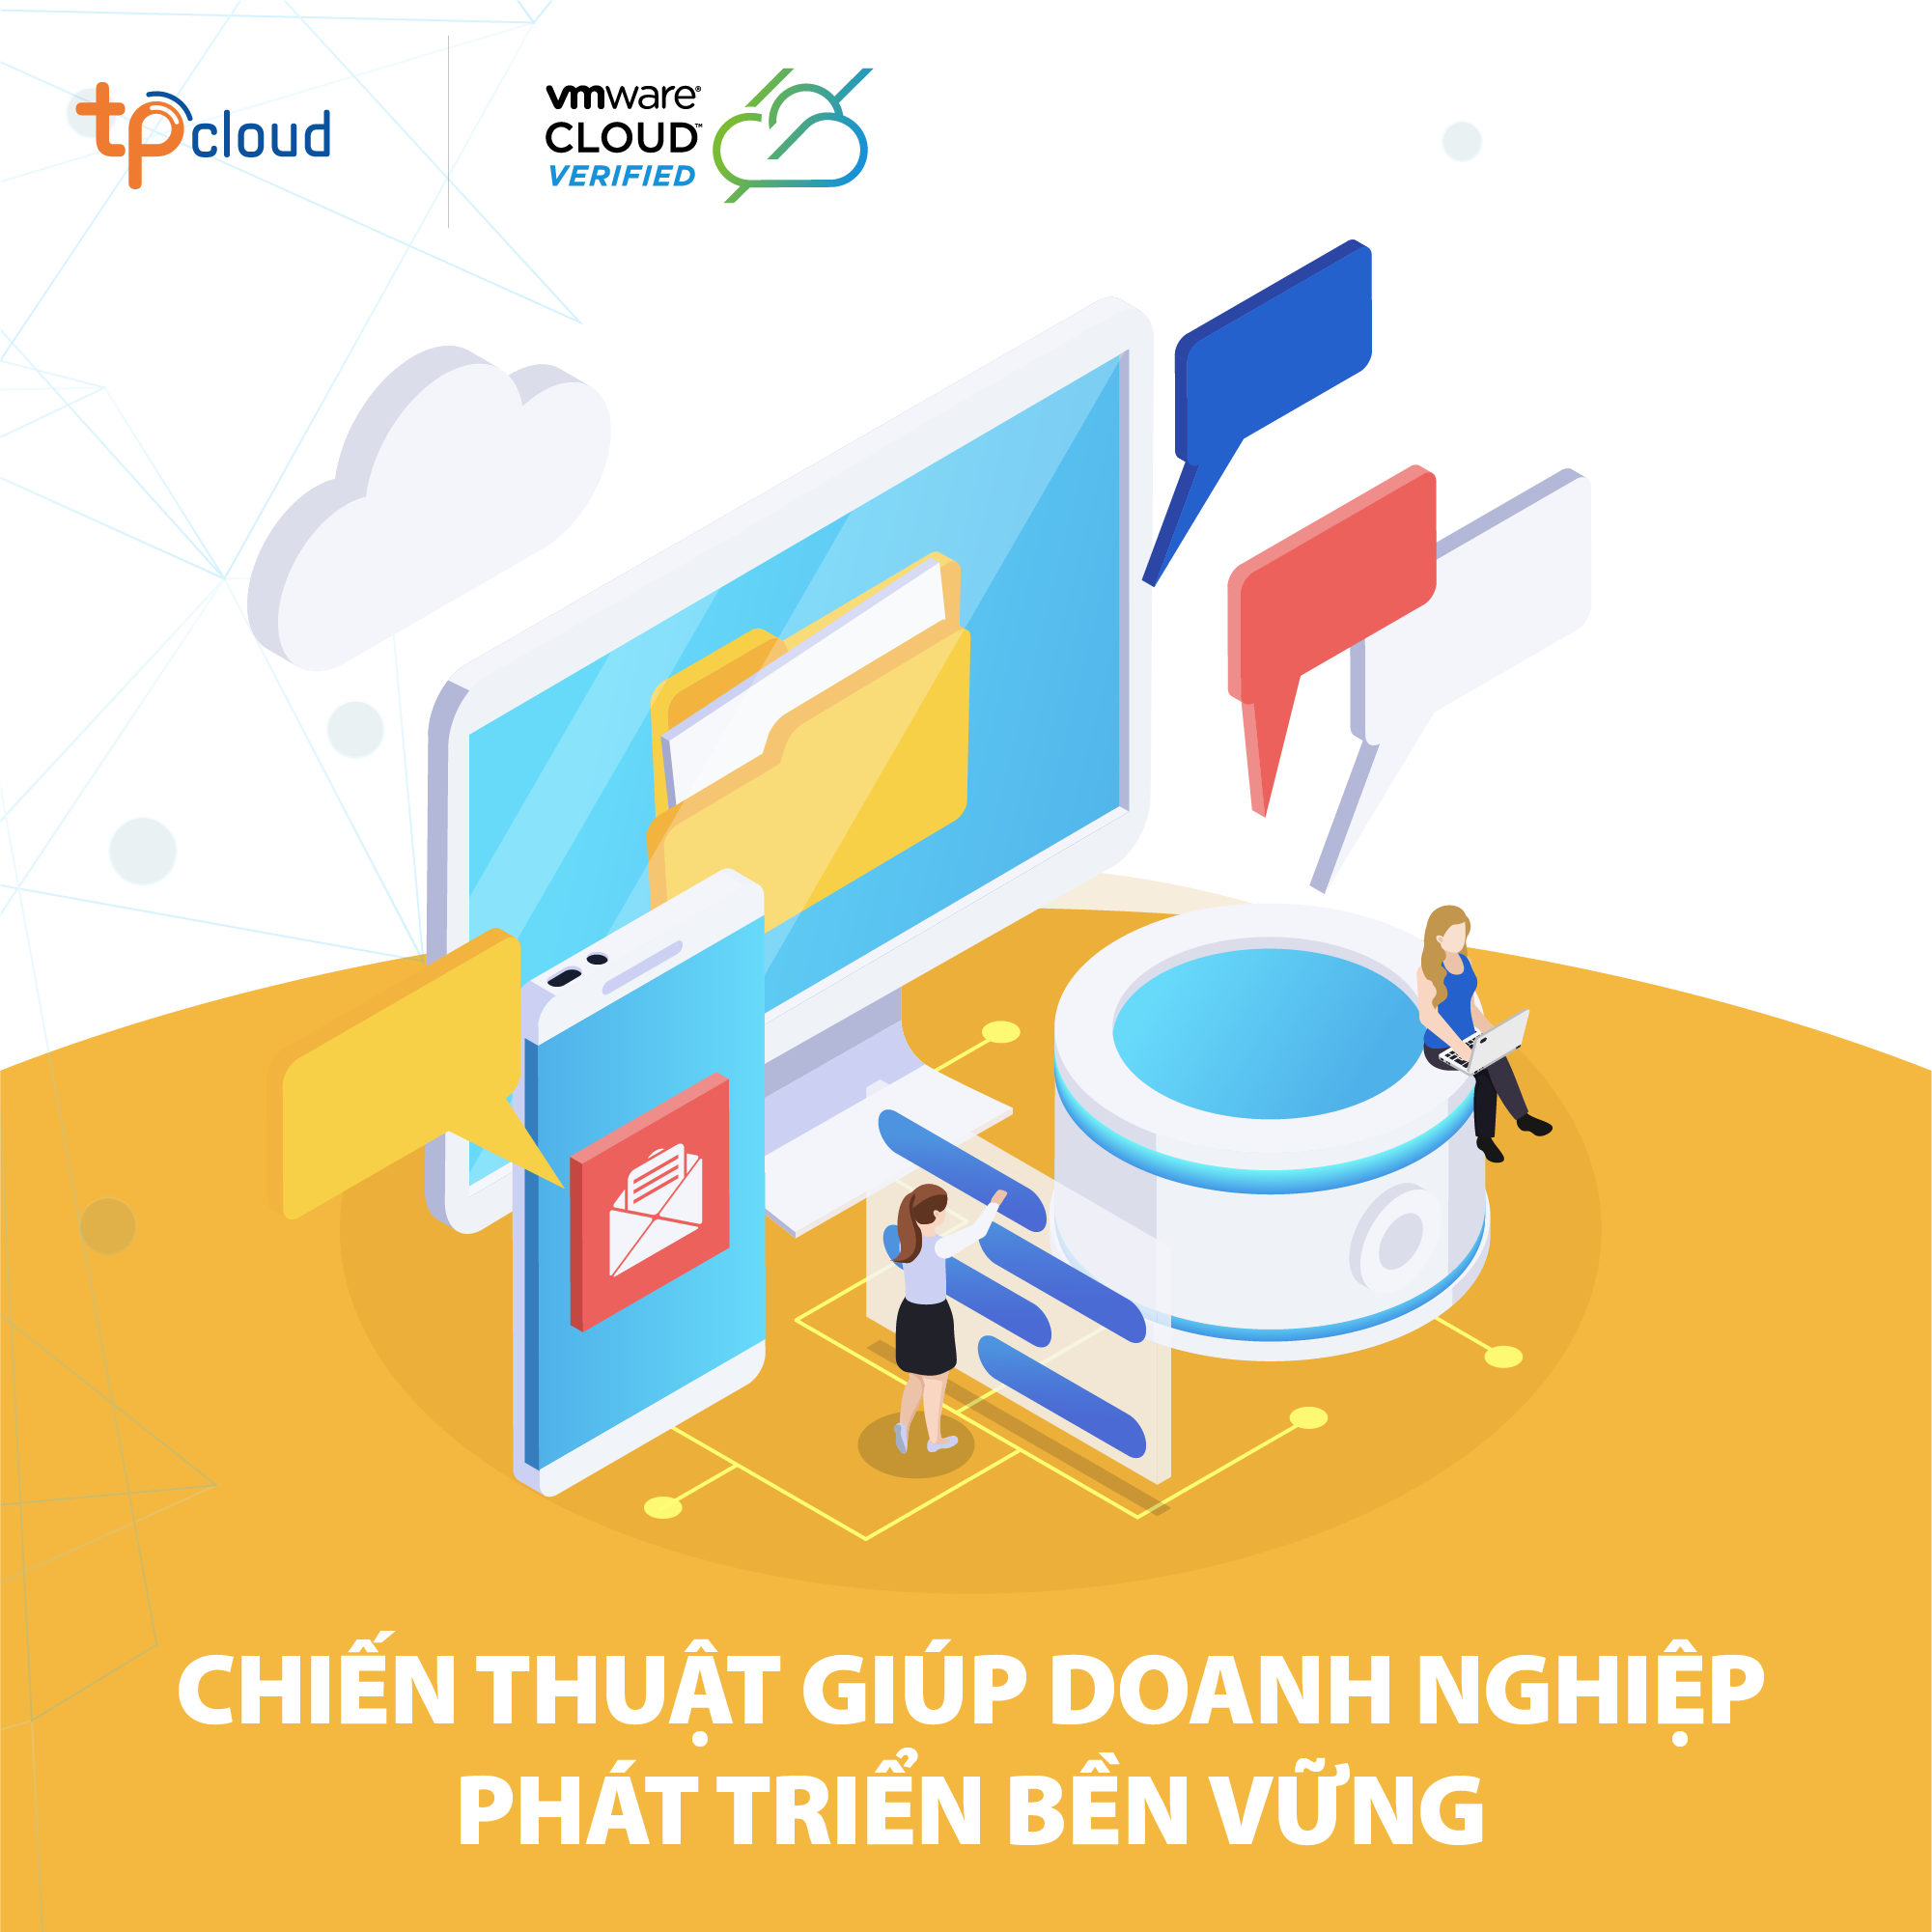 nhung-tinh-nang-noi-bat-cua-dich-vu-cloud-server